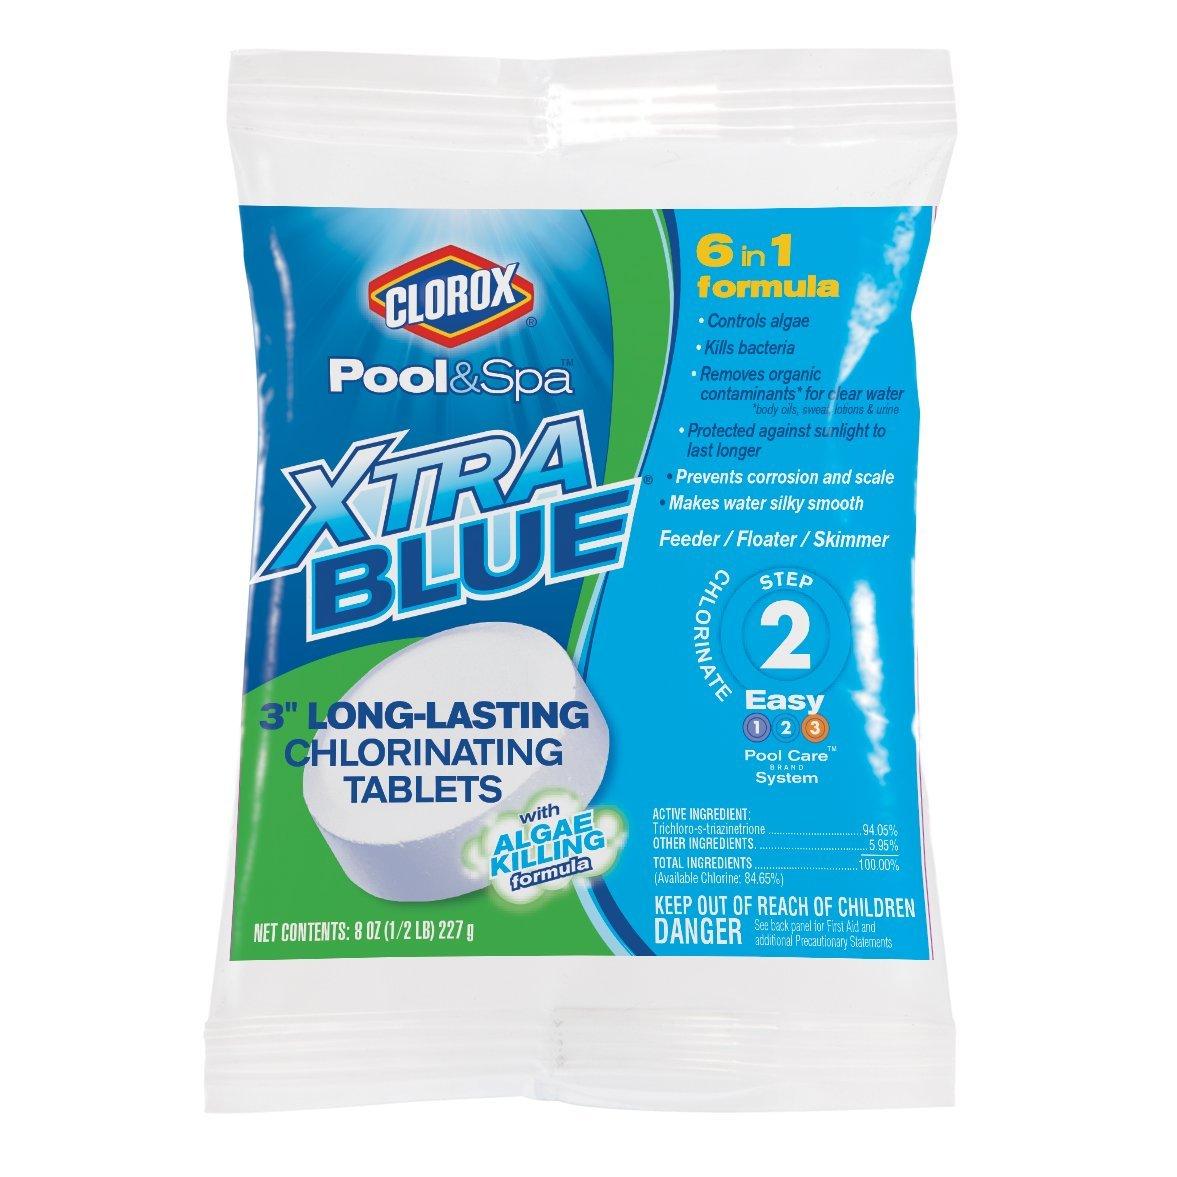 CLOROX Pool&Spa 23000CLX Xtrablue 3'' Long Lasting Chlorinating Tablets